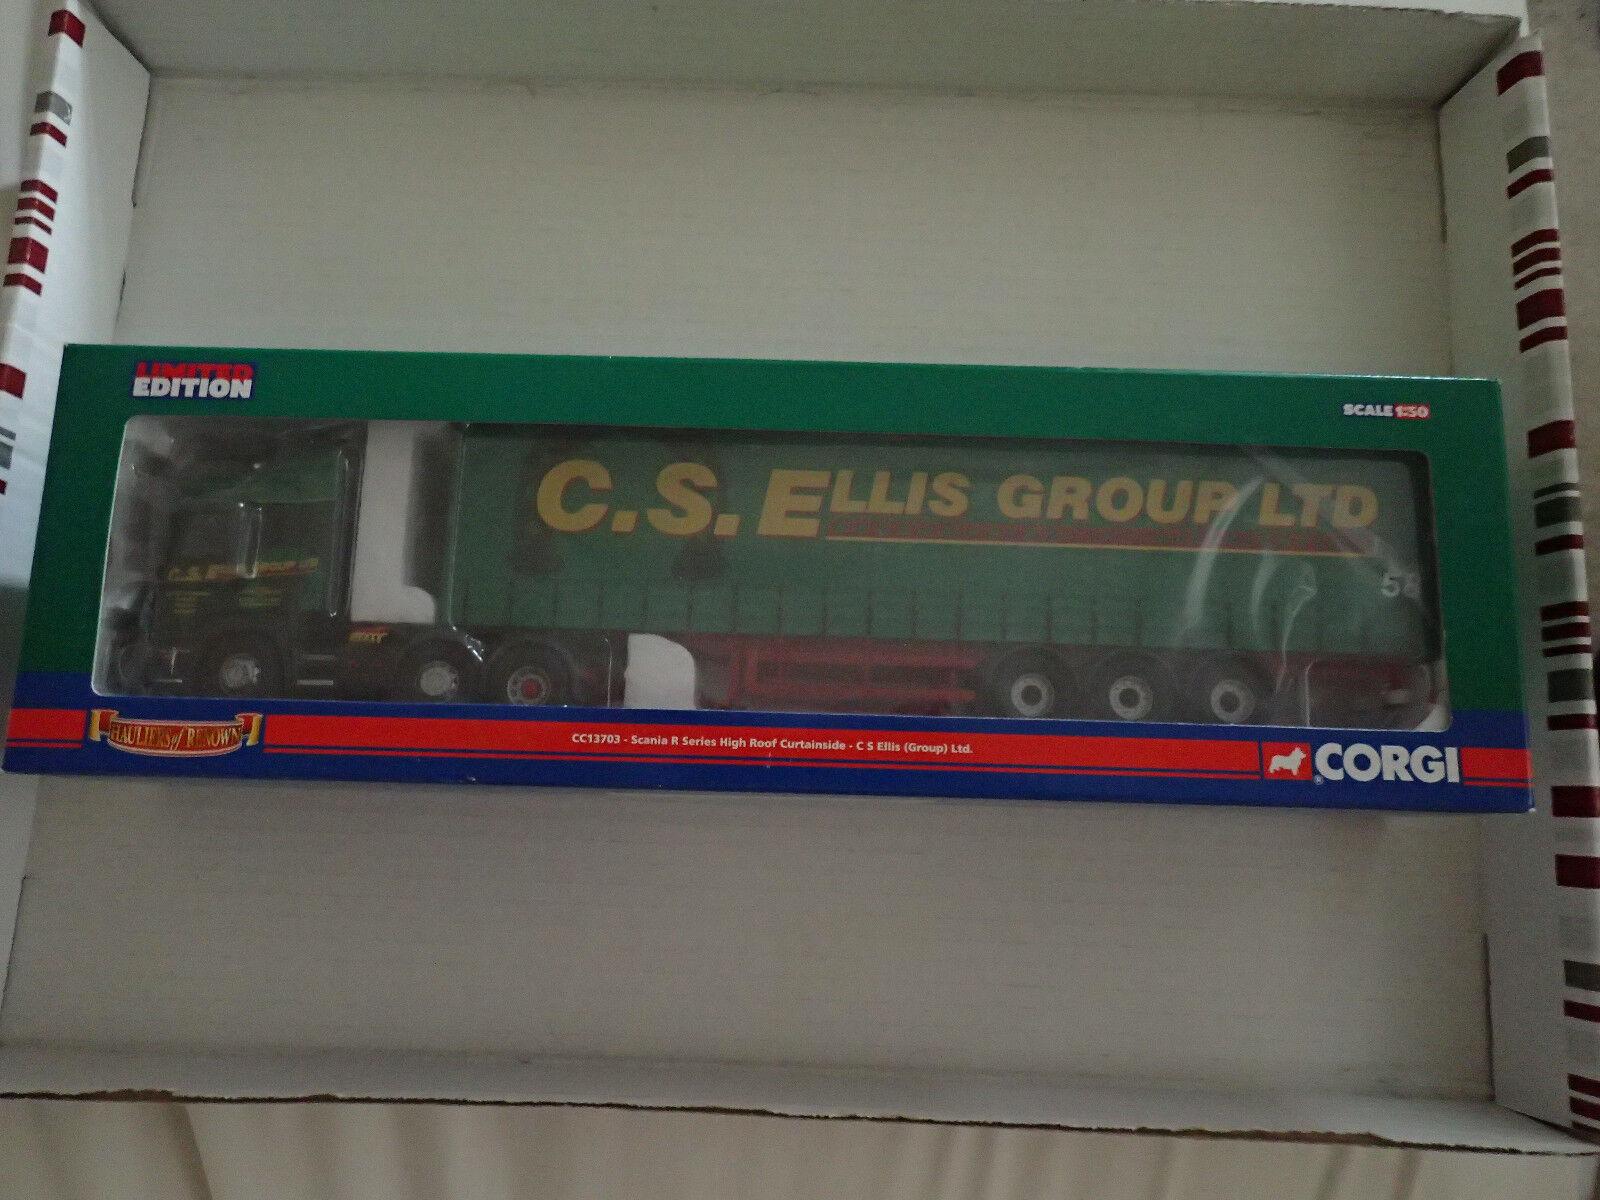 Corgi 1 50 CC13703 Scania R Series Curtainside C S Ellis Decert Untouched